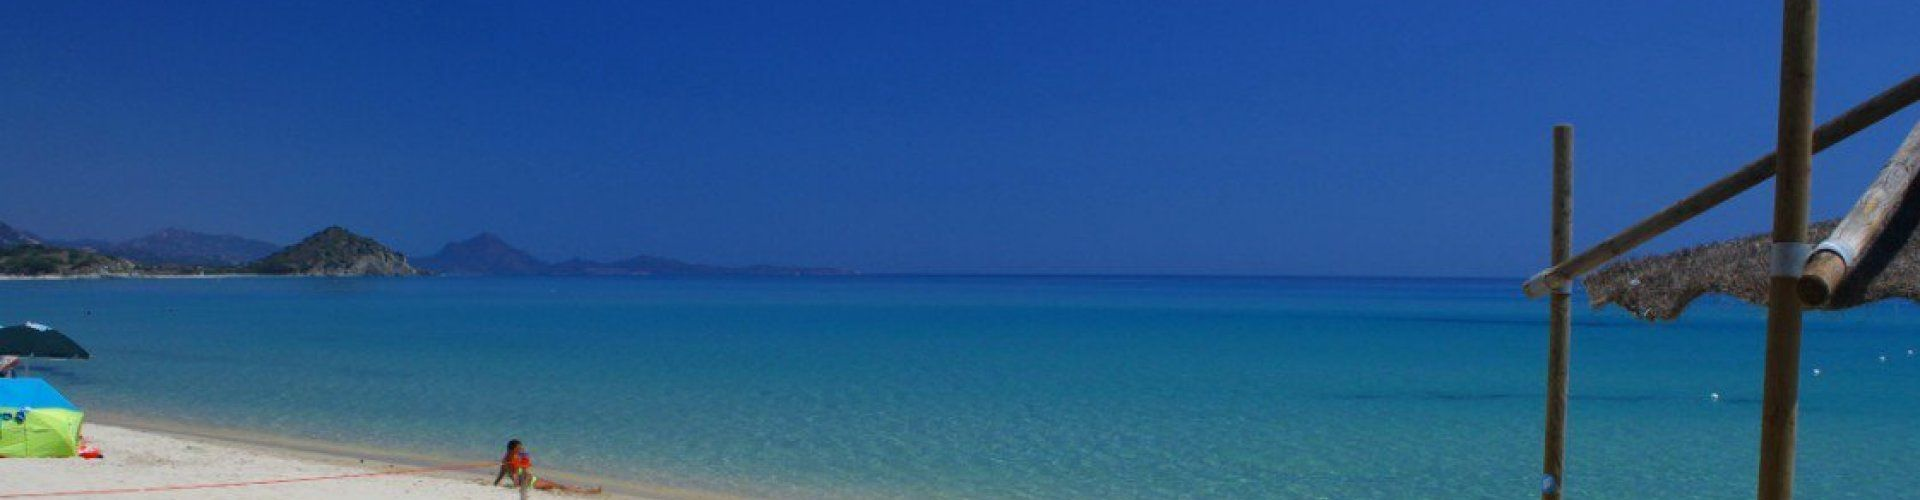 Beach Cala Sinzias